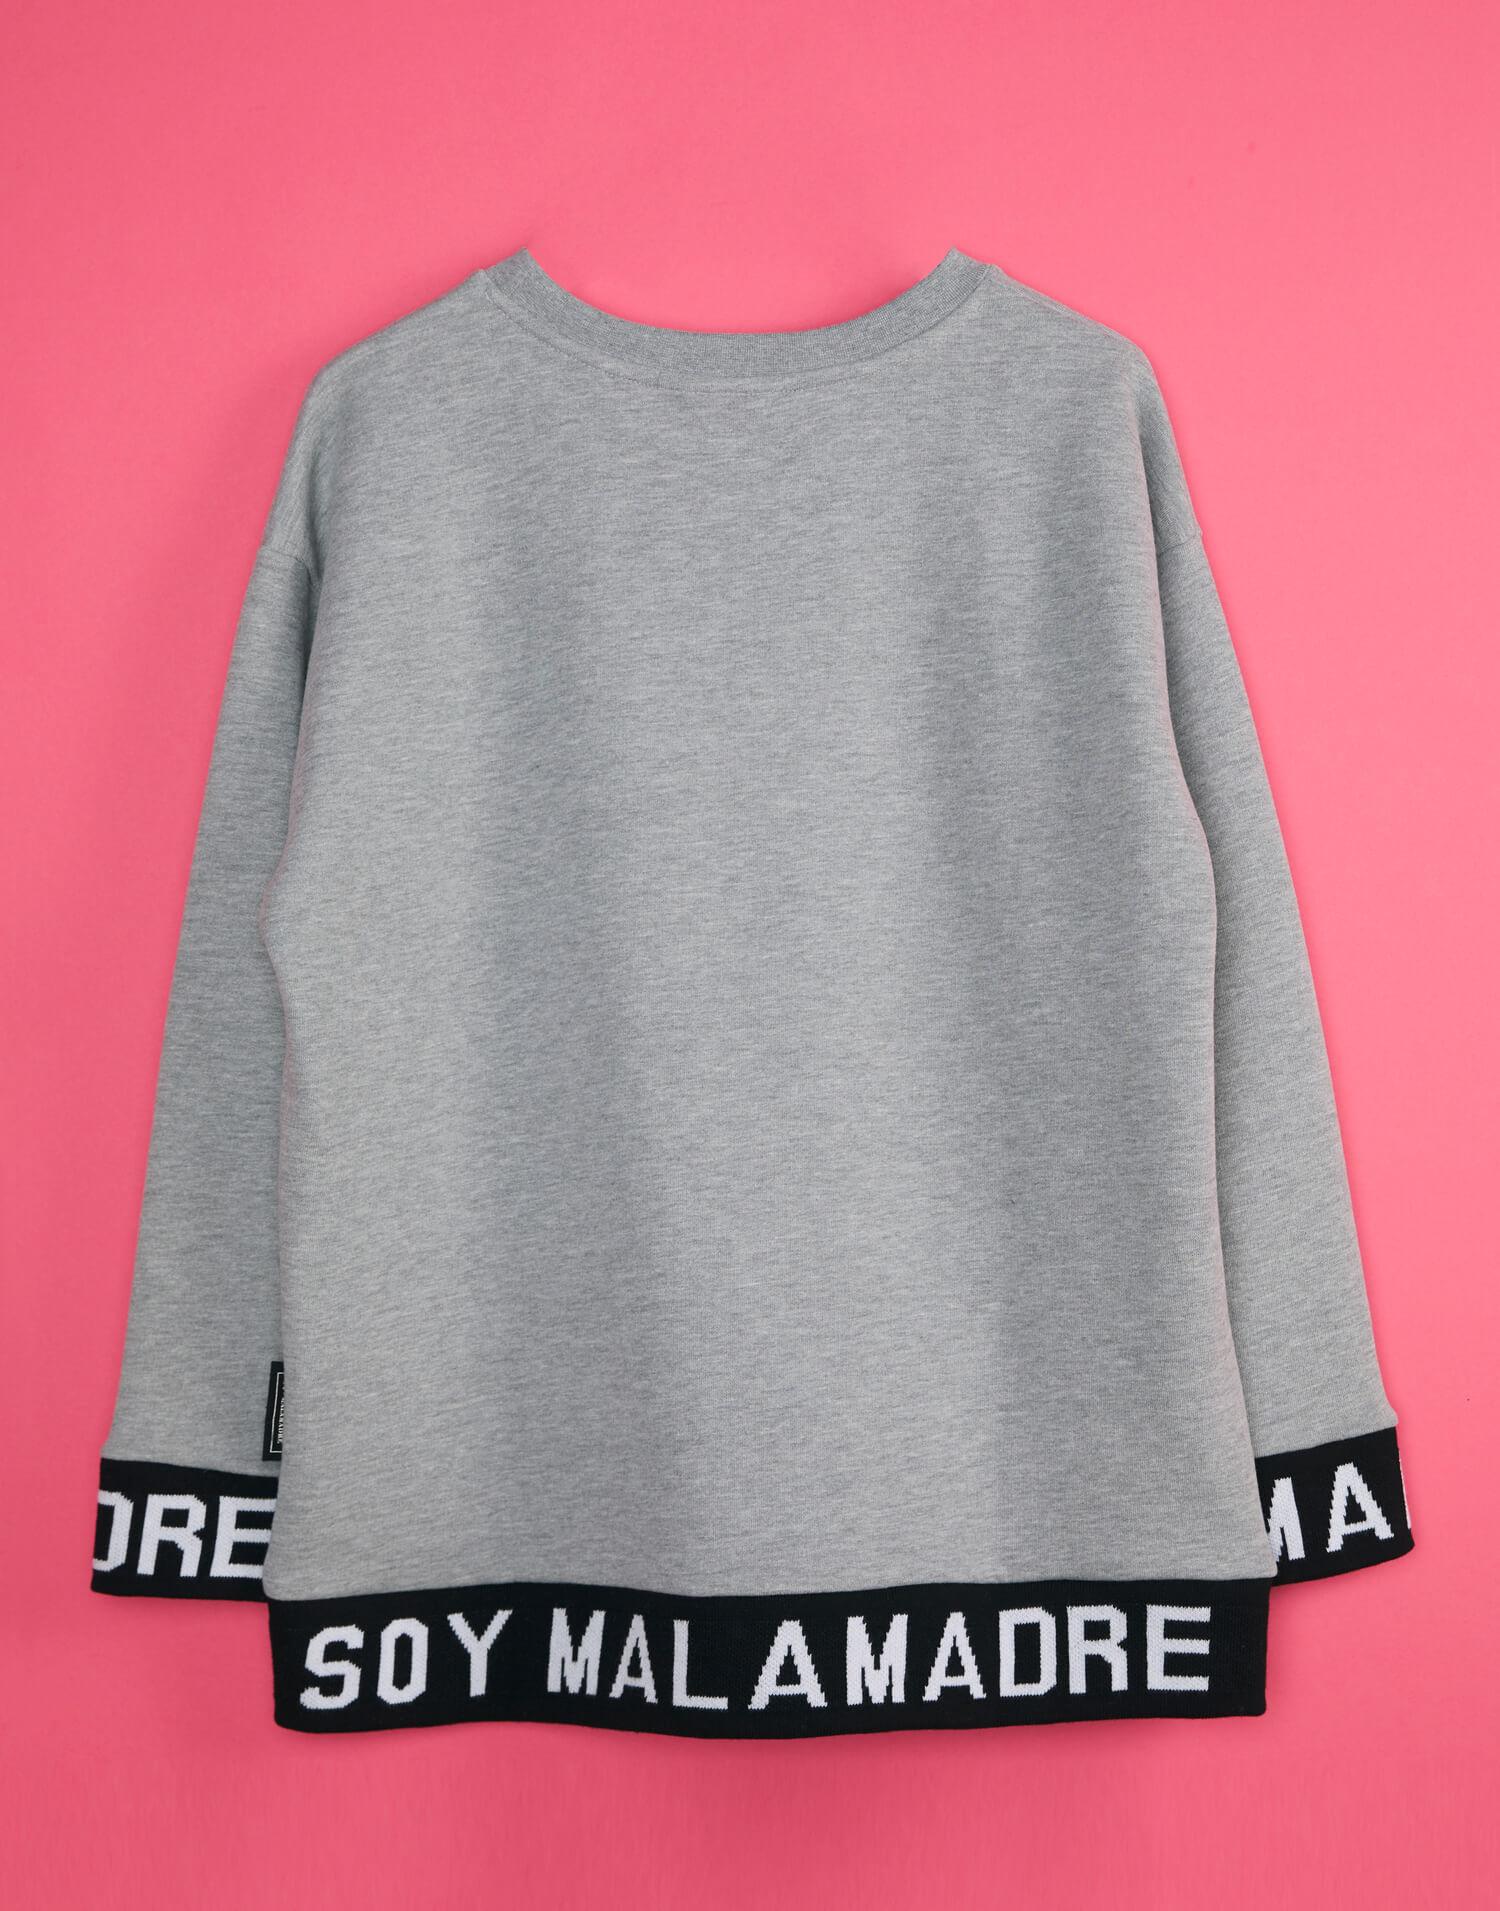 Sudadera gris 'Soy Malamadre'